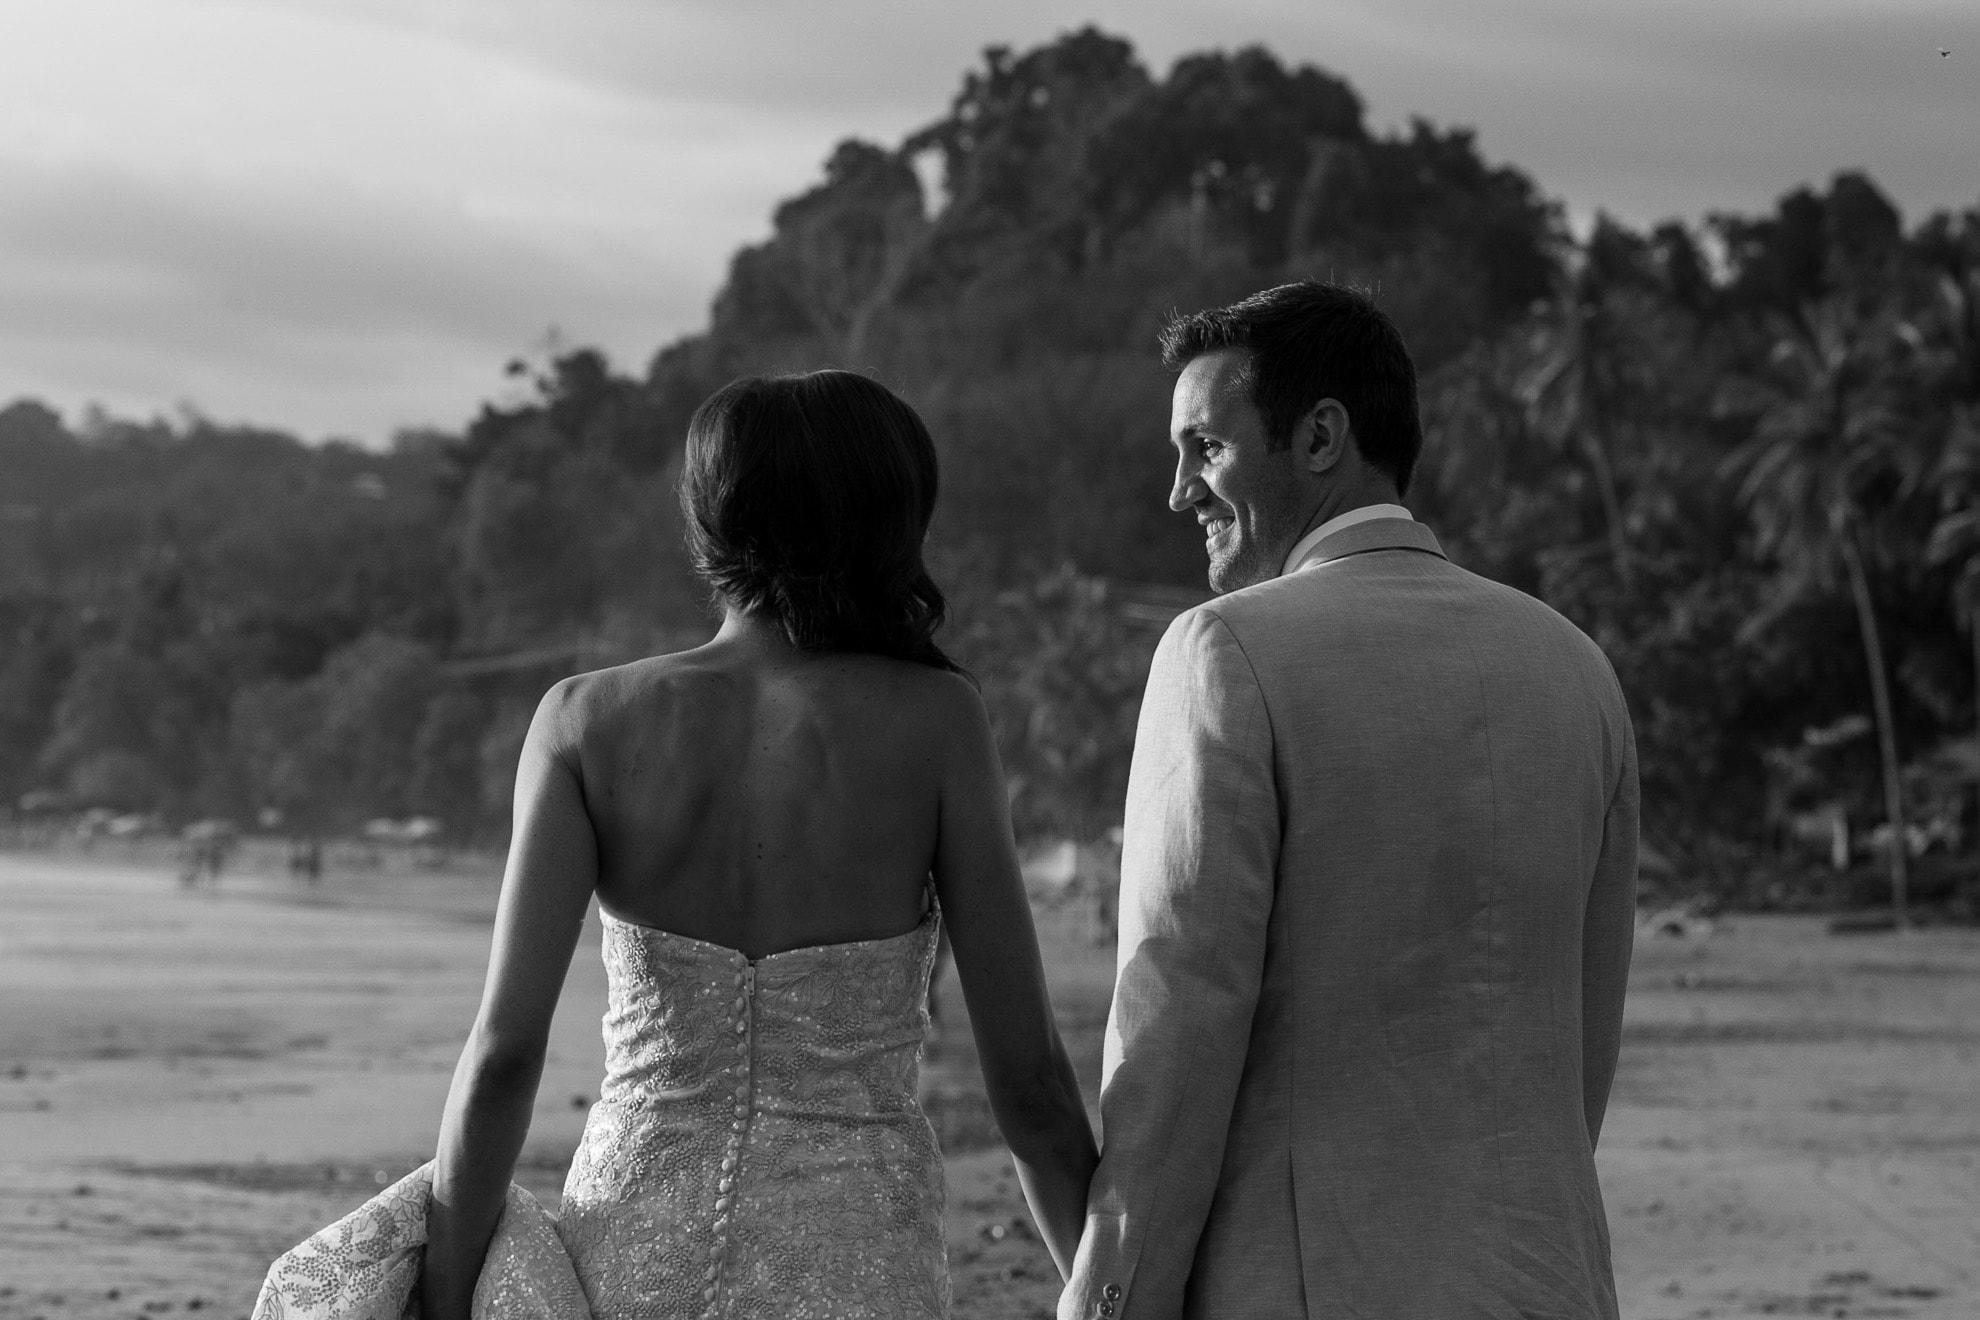 Bride and groom walking at beach.